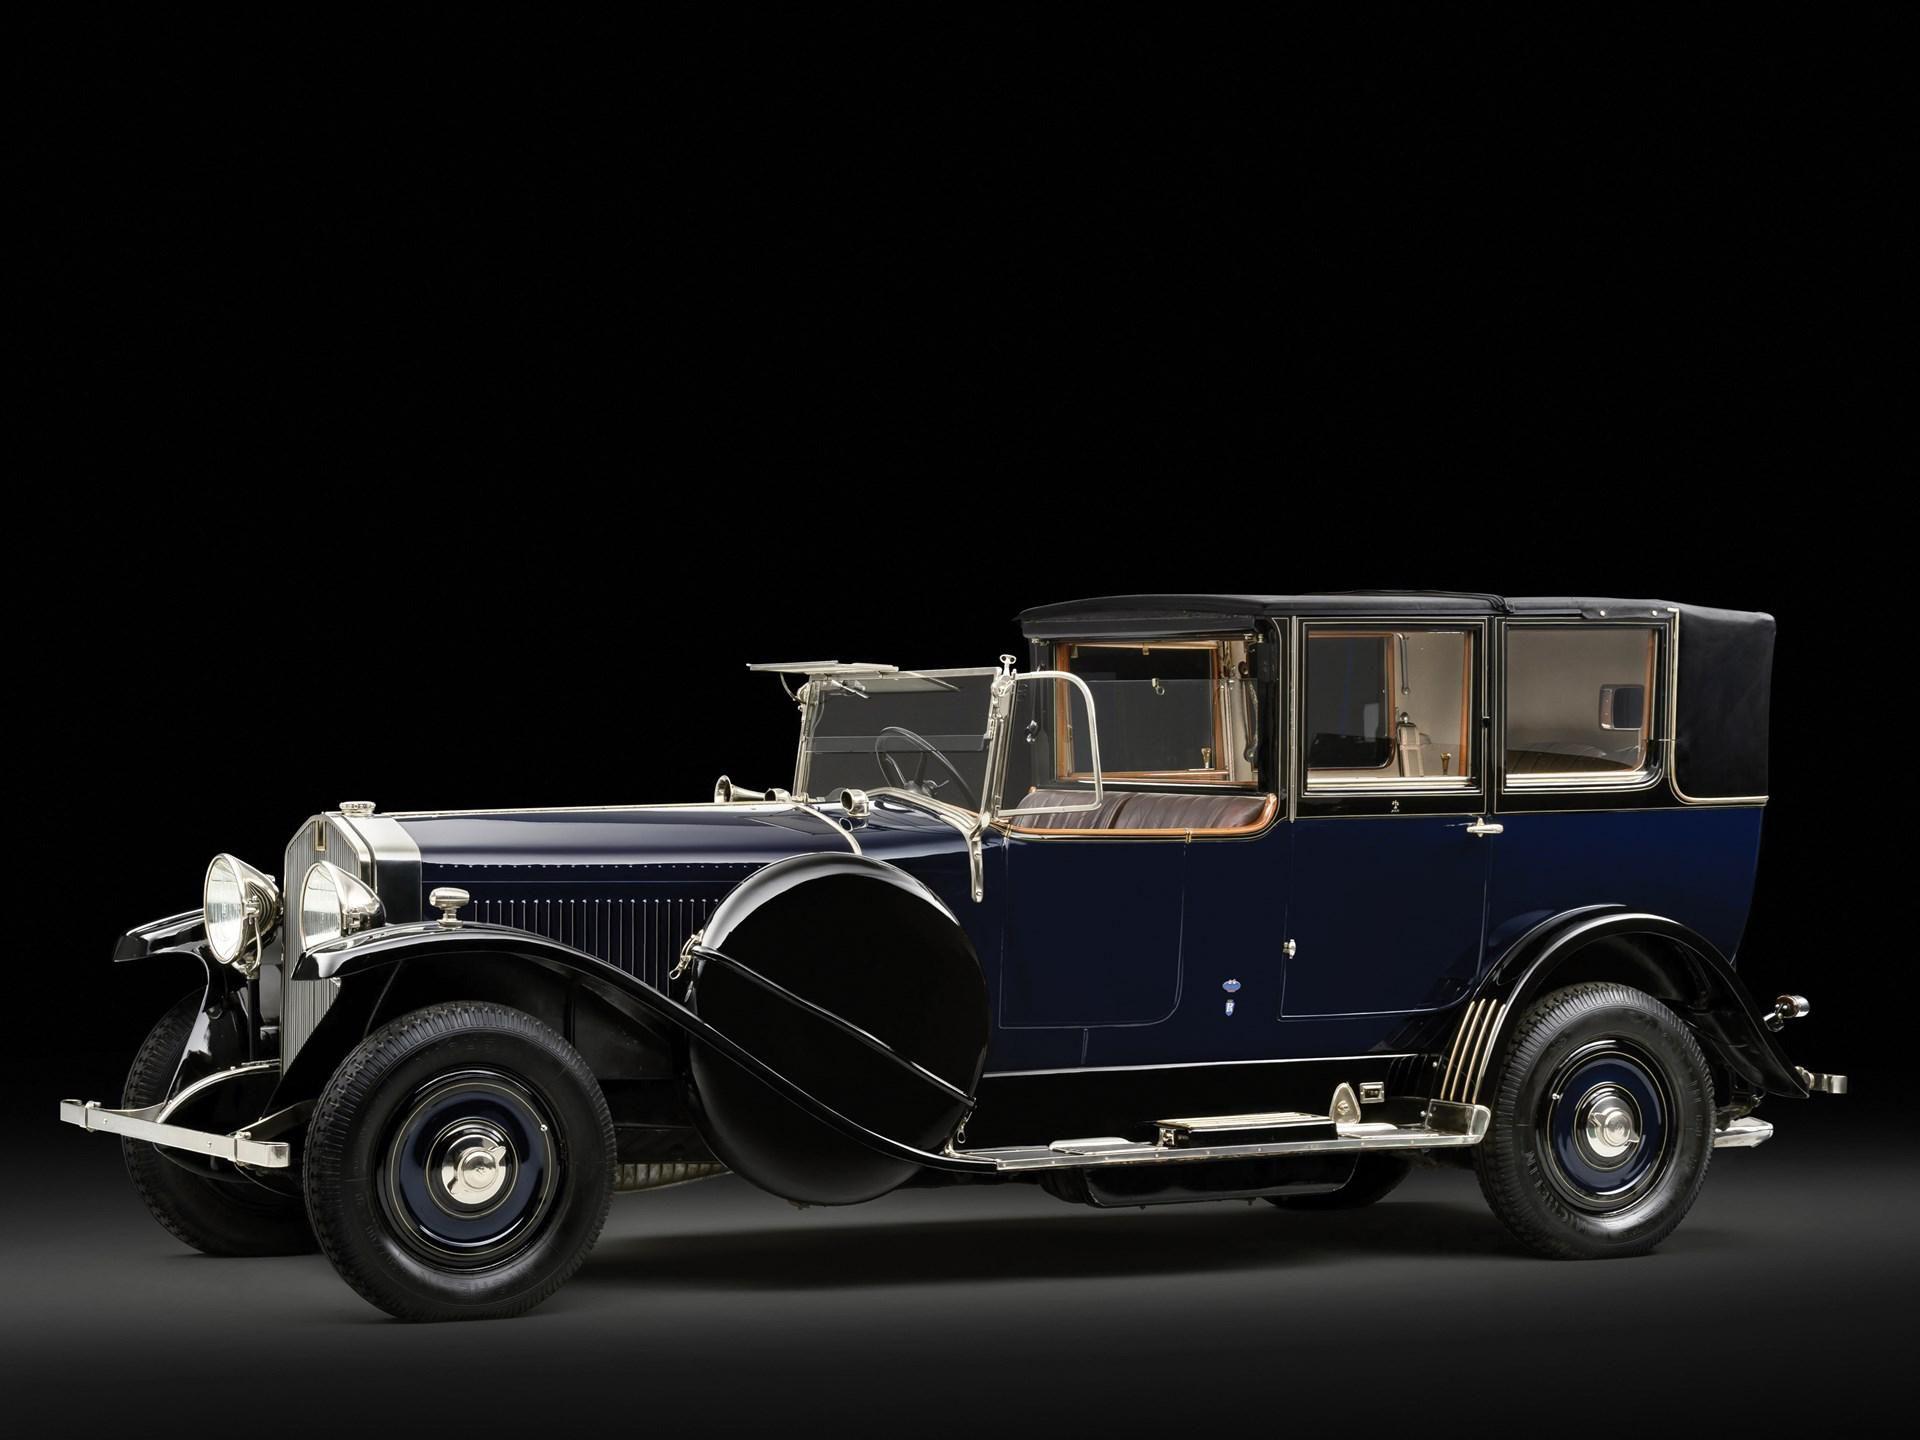 1924 Isotta Fraschini Tipo 8A Landaulet by Carrozzeria Sala